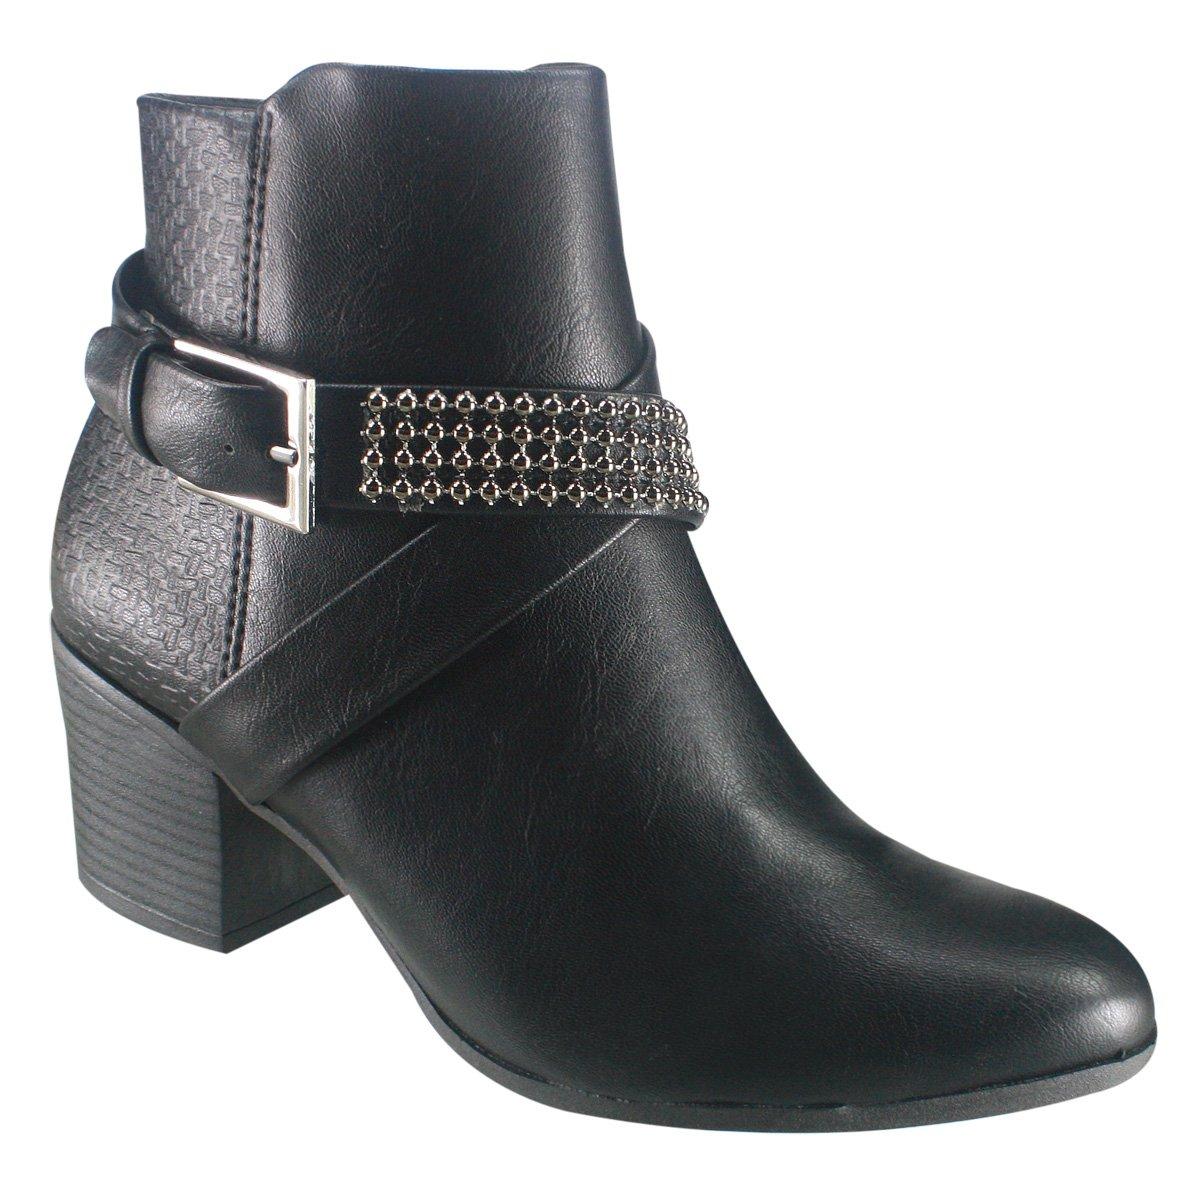 c1994cdbf Amplie a imagem. Bota Feminina Ramarim Ankle Boot; Bota Feminina Ramarim  Ankle Boot 2; Bota Feminina ...